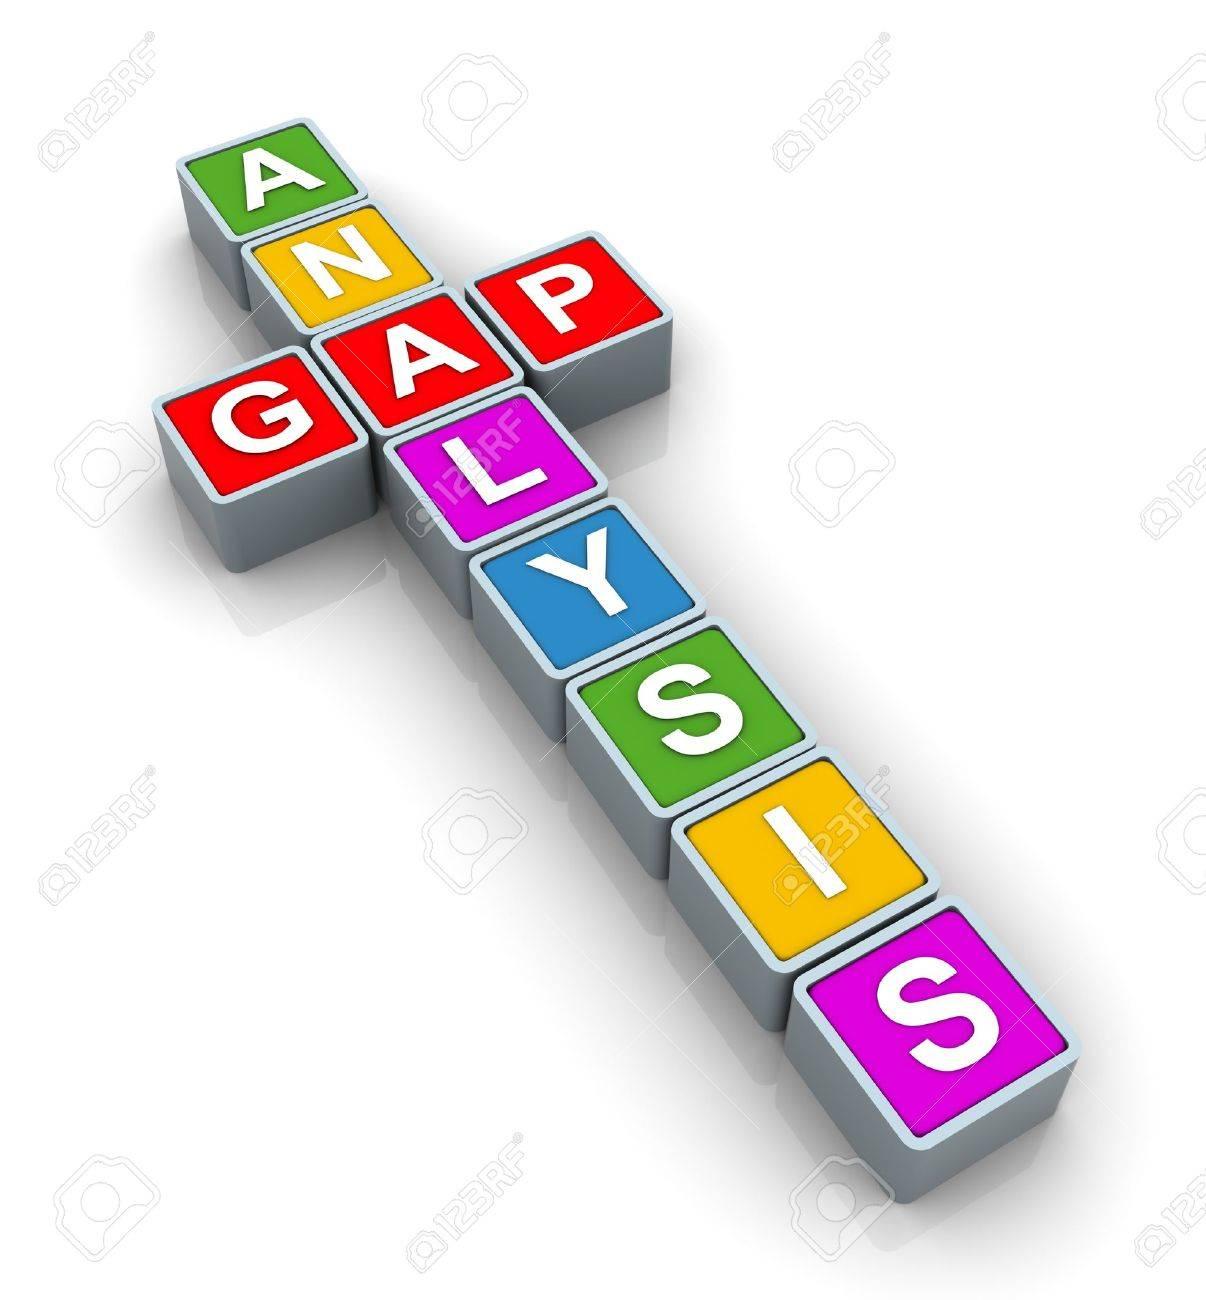 harrison keyes gap analysis